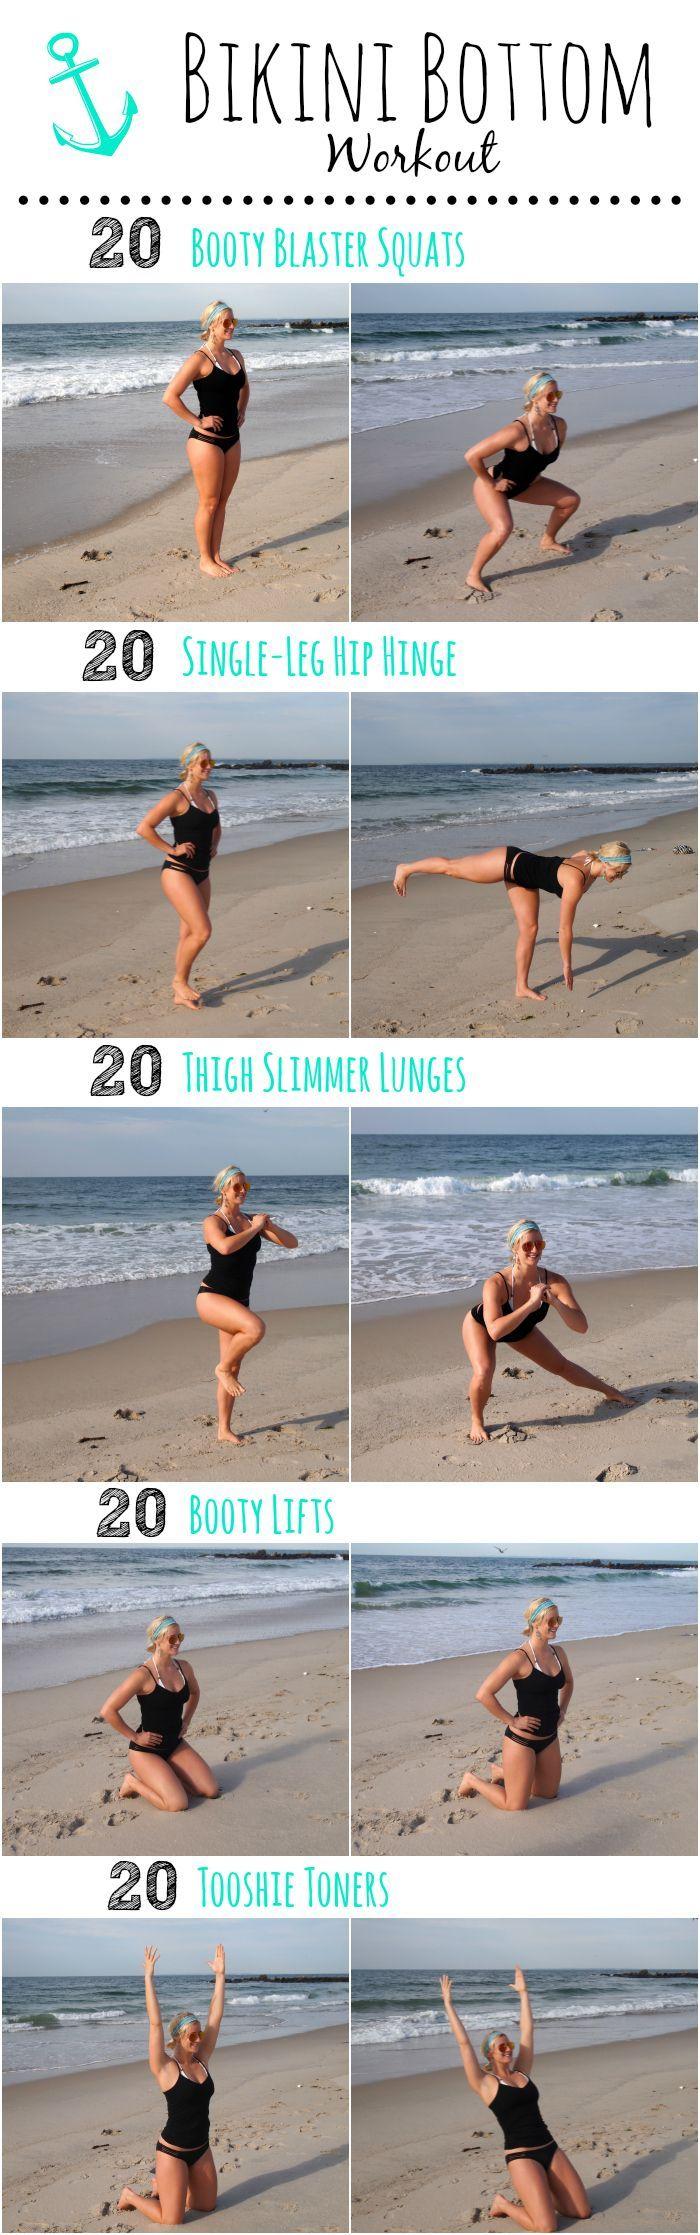 Bikini Bottom Workout - feel confident in your teeny weeny bikinis!! ;)